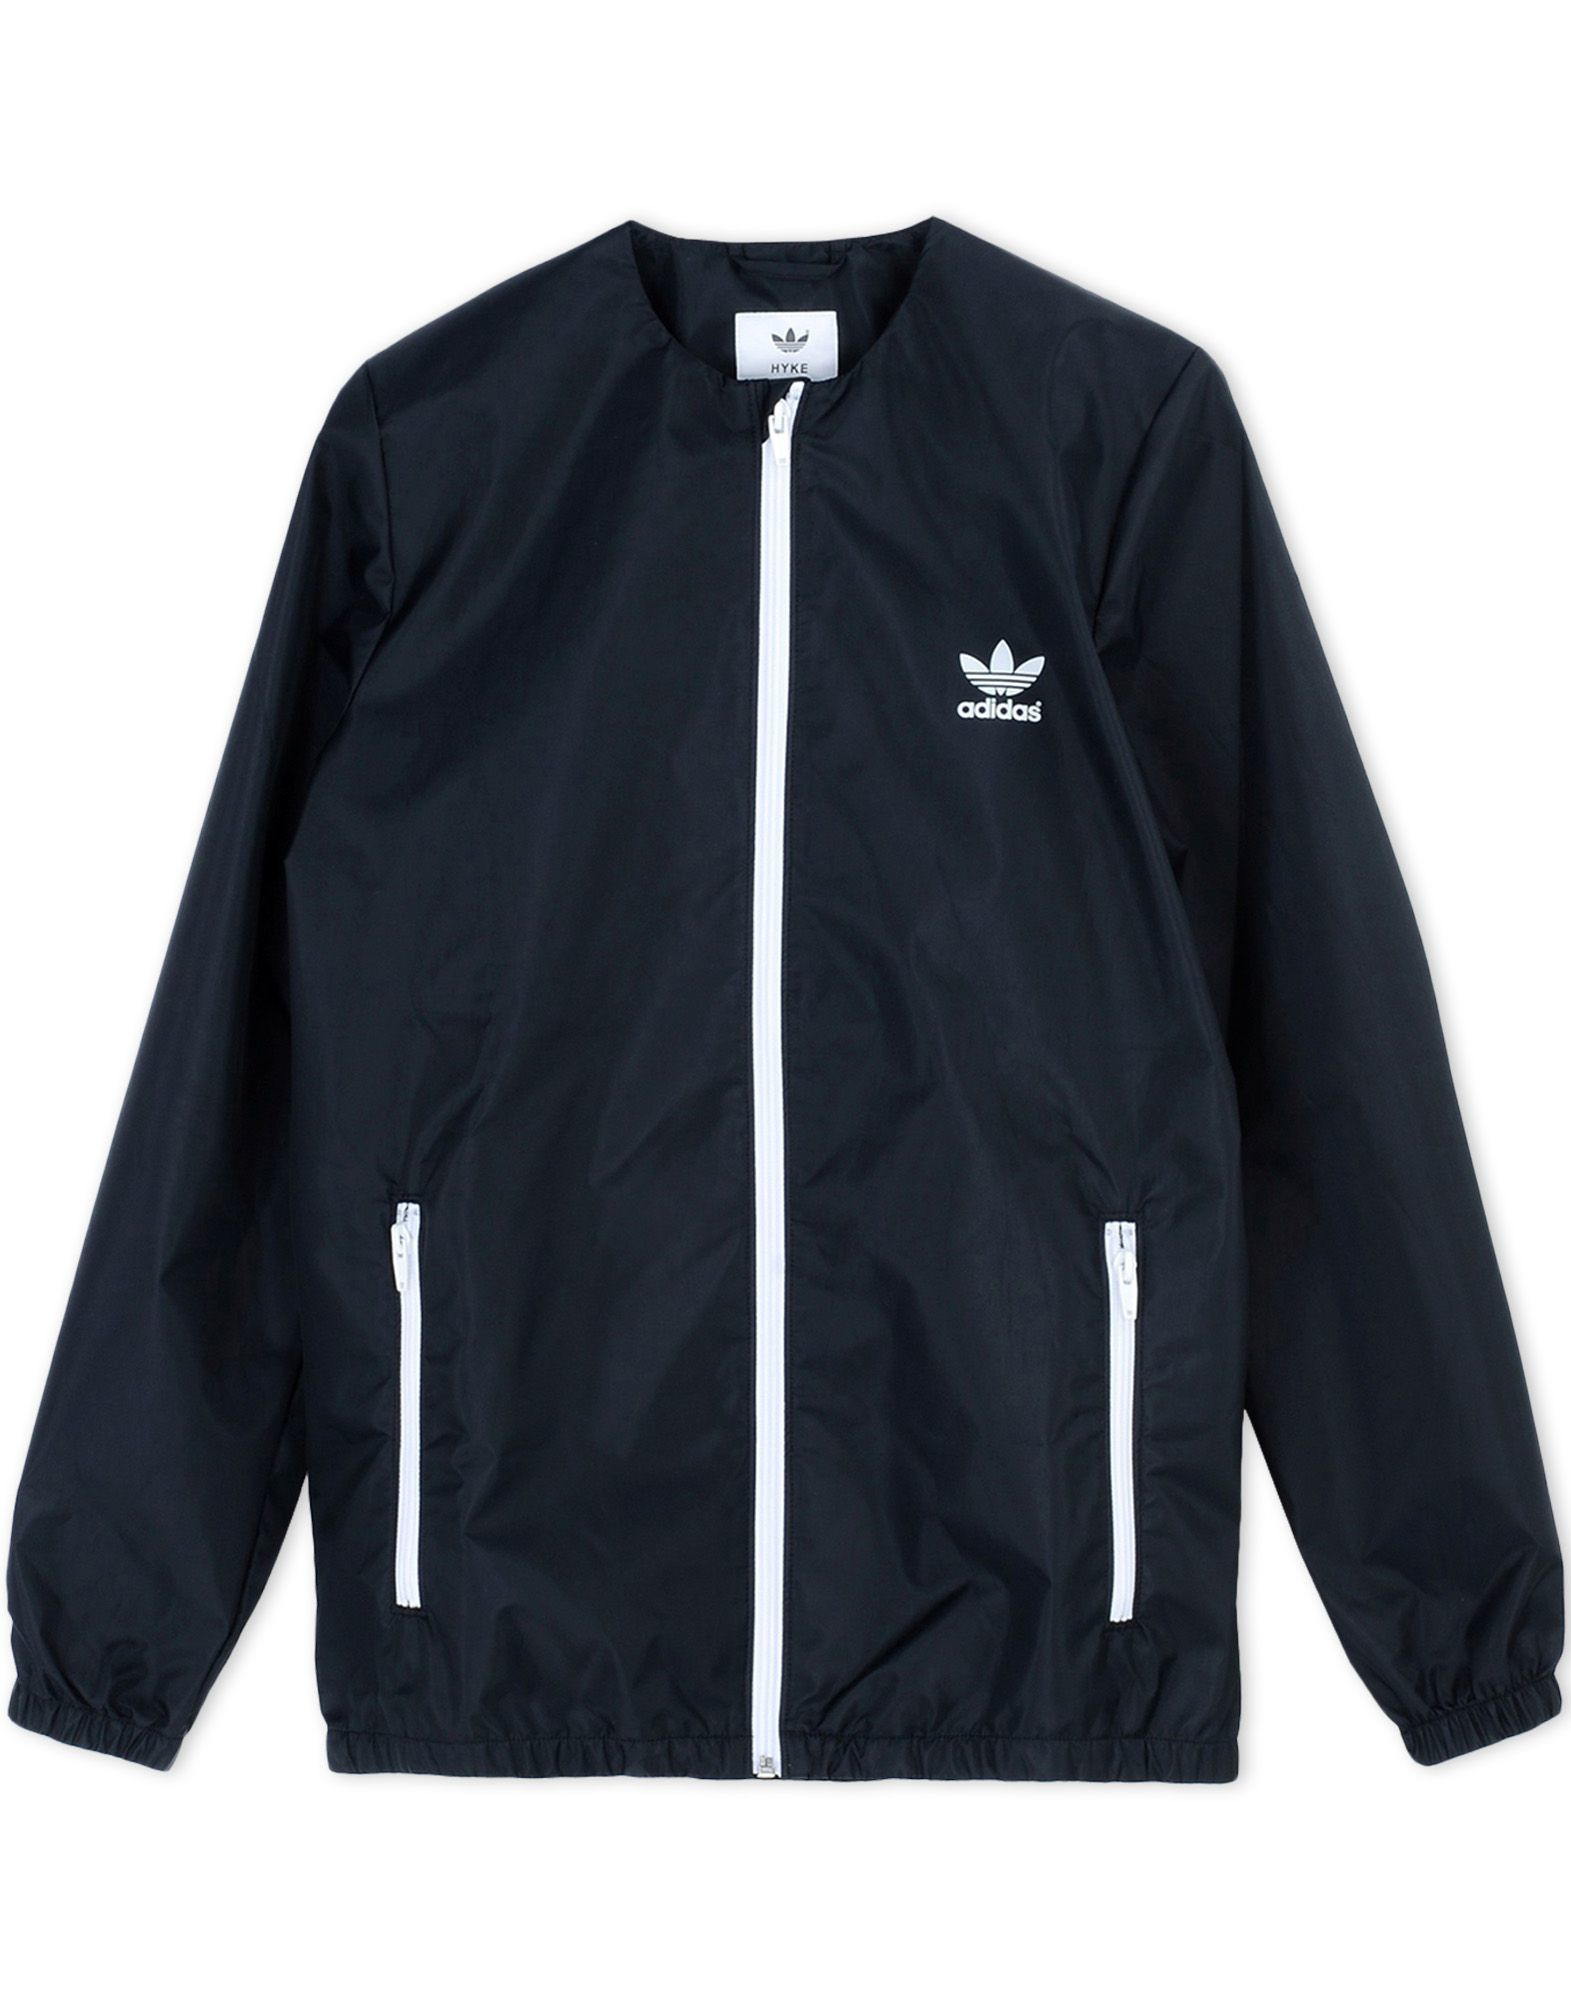 Adidas Originals Jacket in Black - Lyst